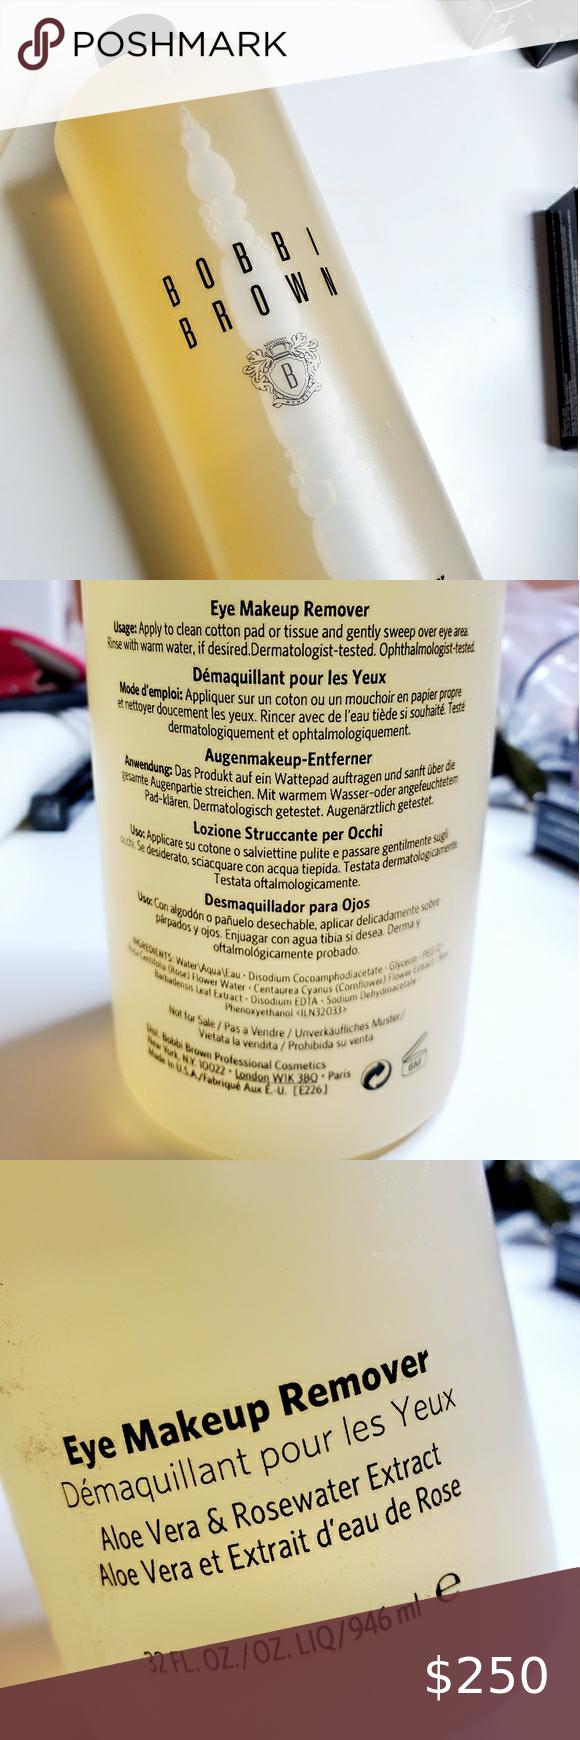 Bobbi brown eye makeup removal new in 2020 Eye makeup